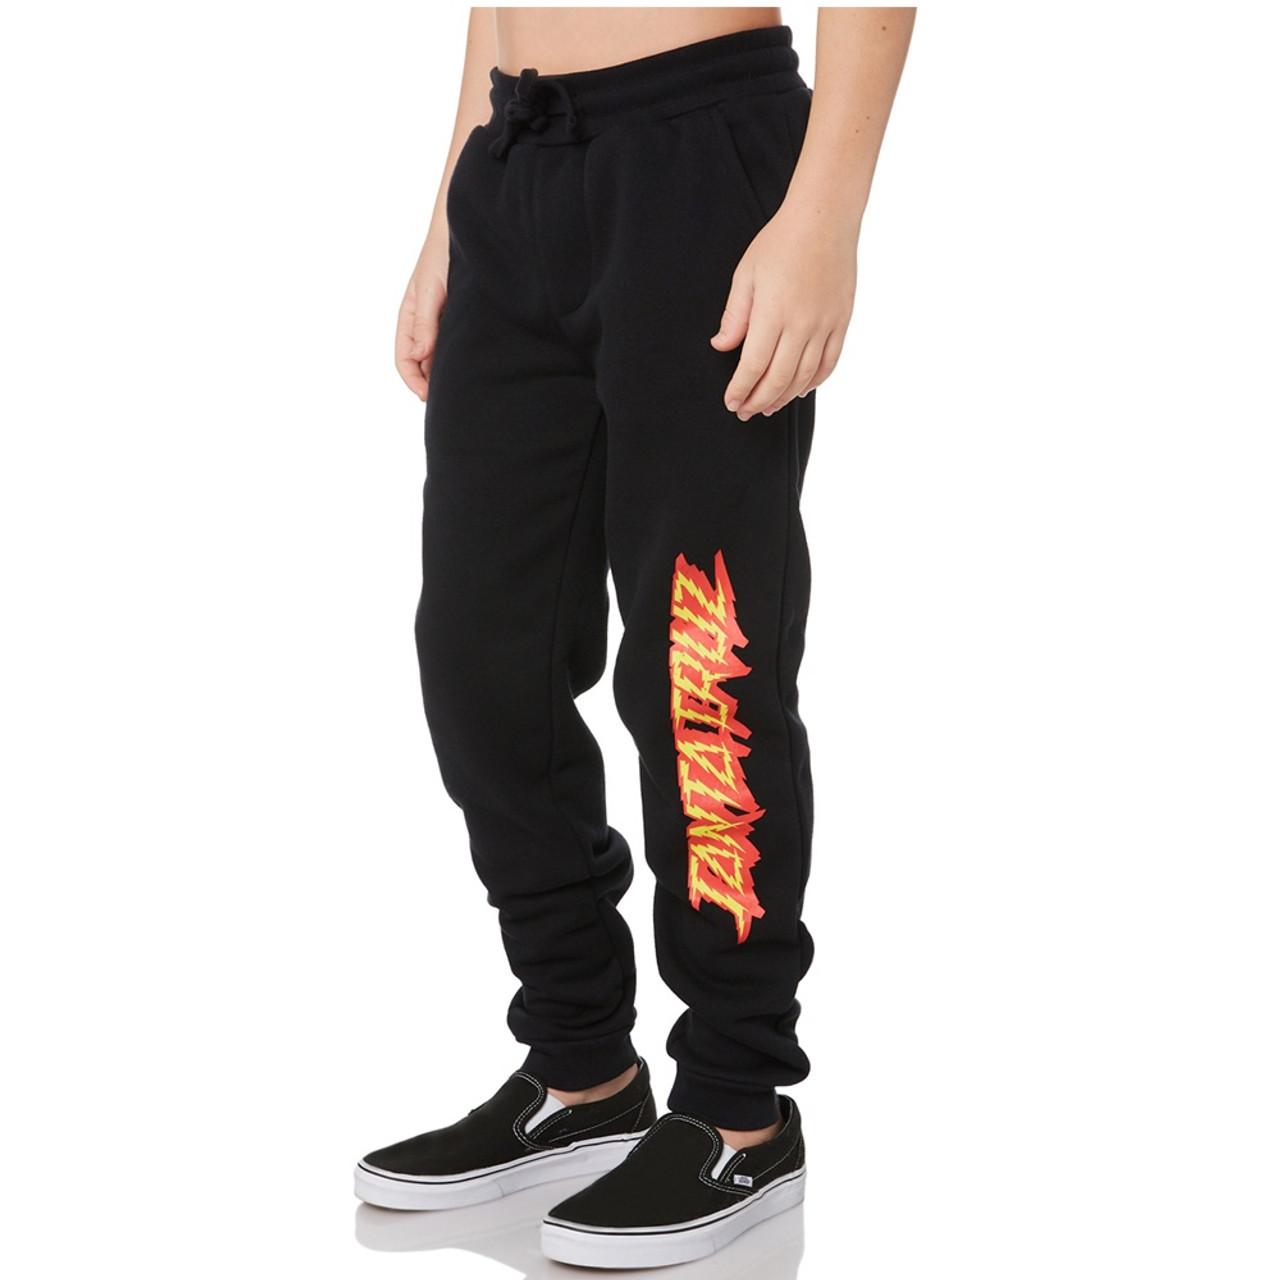 SANTA CRUZ Shock Strip Track Youth Pants Black